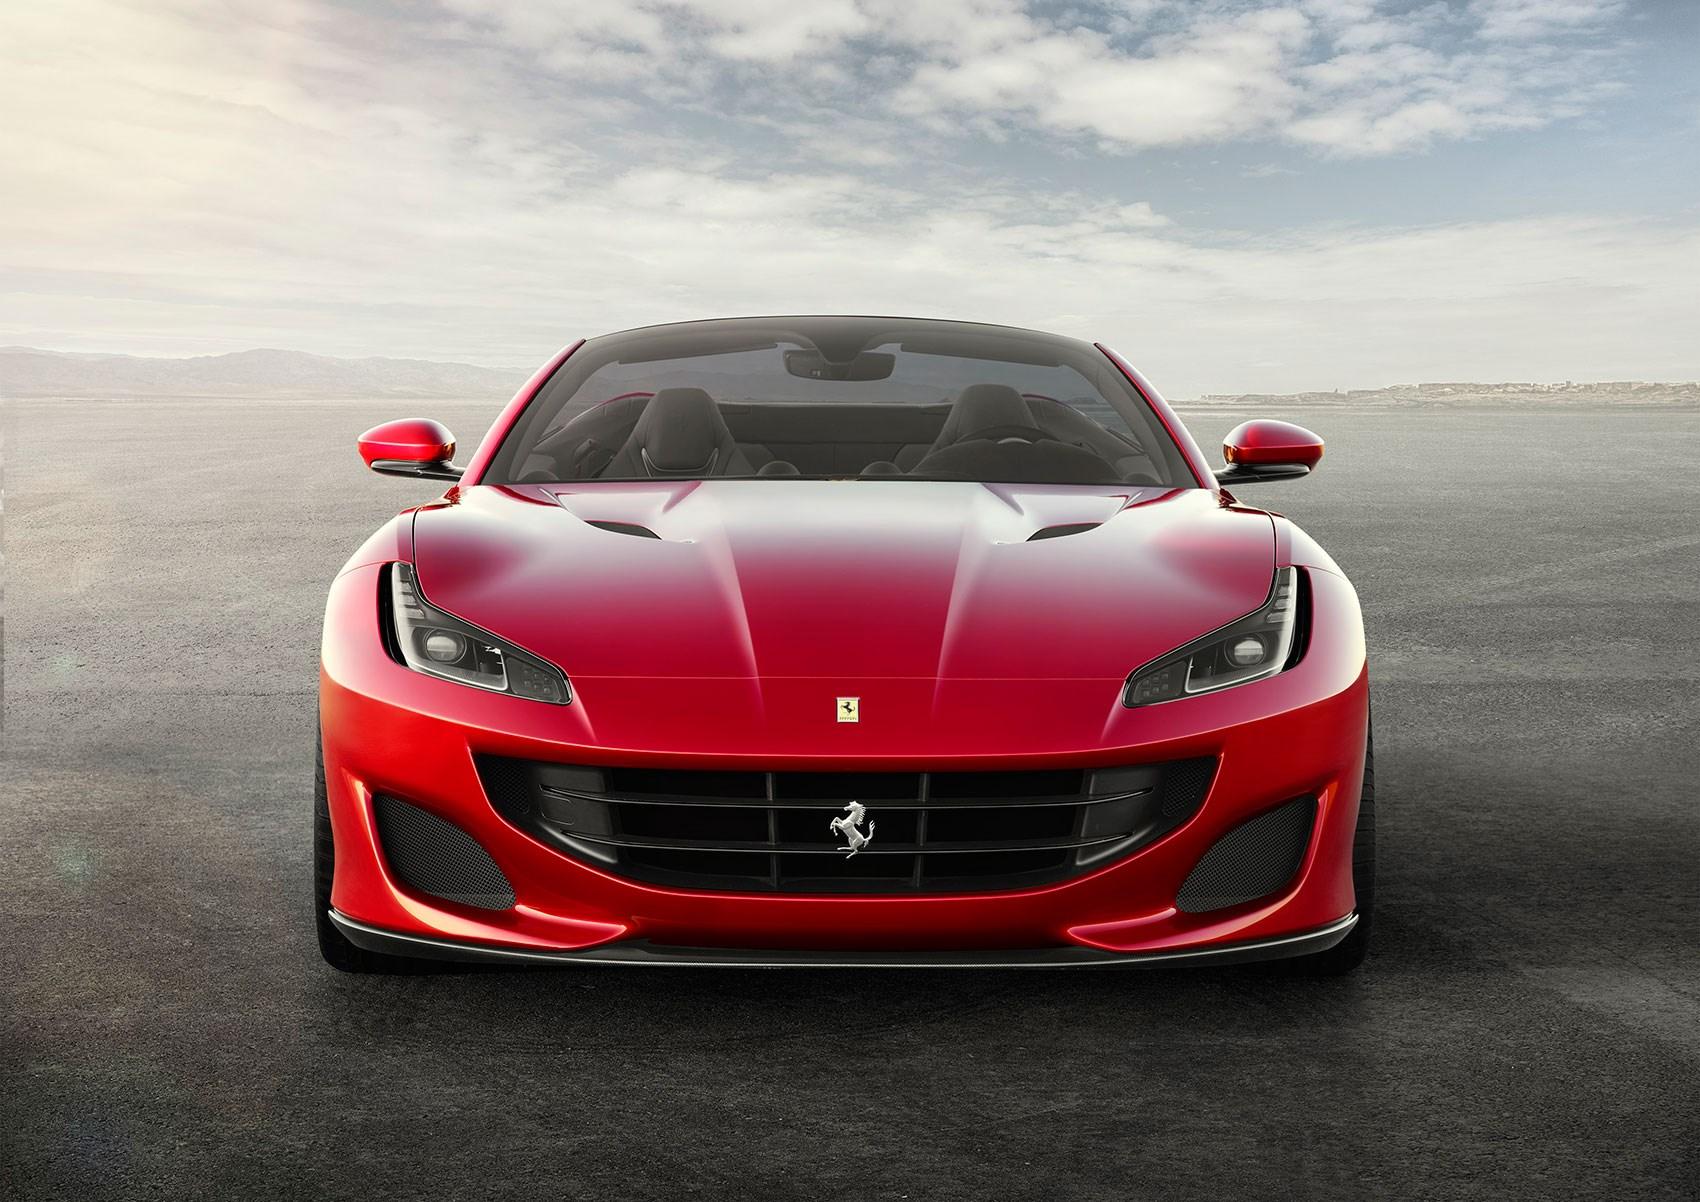 New Ferrari Portofino 2018 revealed in pictures | CAR Magazine on lamborghini cars 2030, lamborghini diablo 2030, lamborghini gallardo 2030, lamborghini concept 2030,